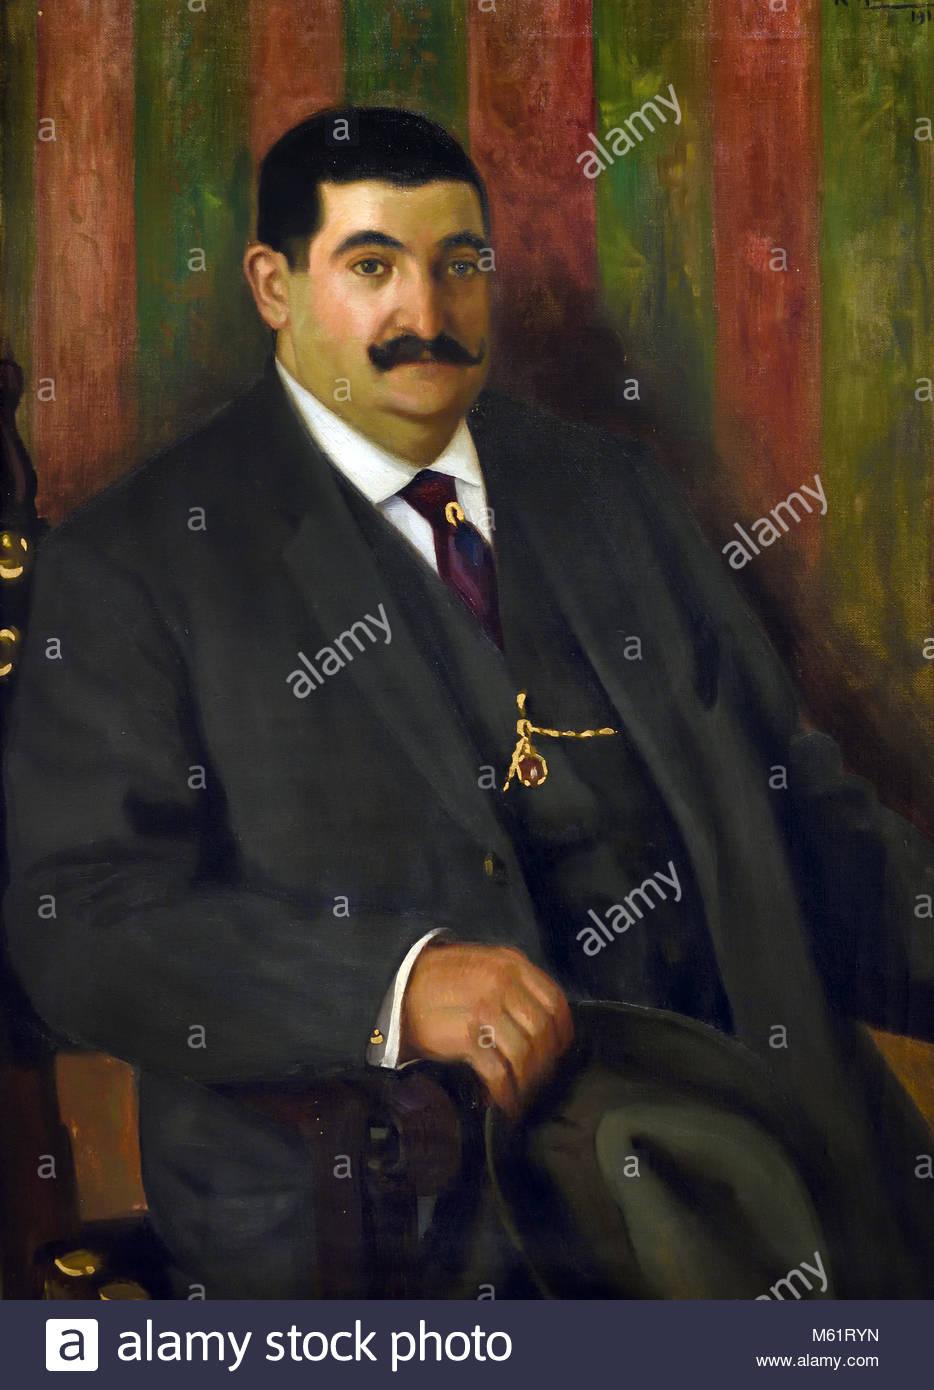 Aguado Arnal Rafael 1880-1951 20esimo secolo Spagna, Spagnolo, Immagini Stock